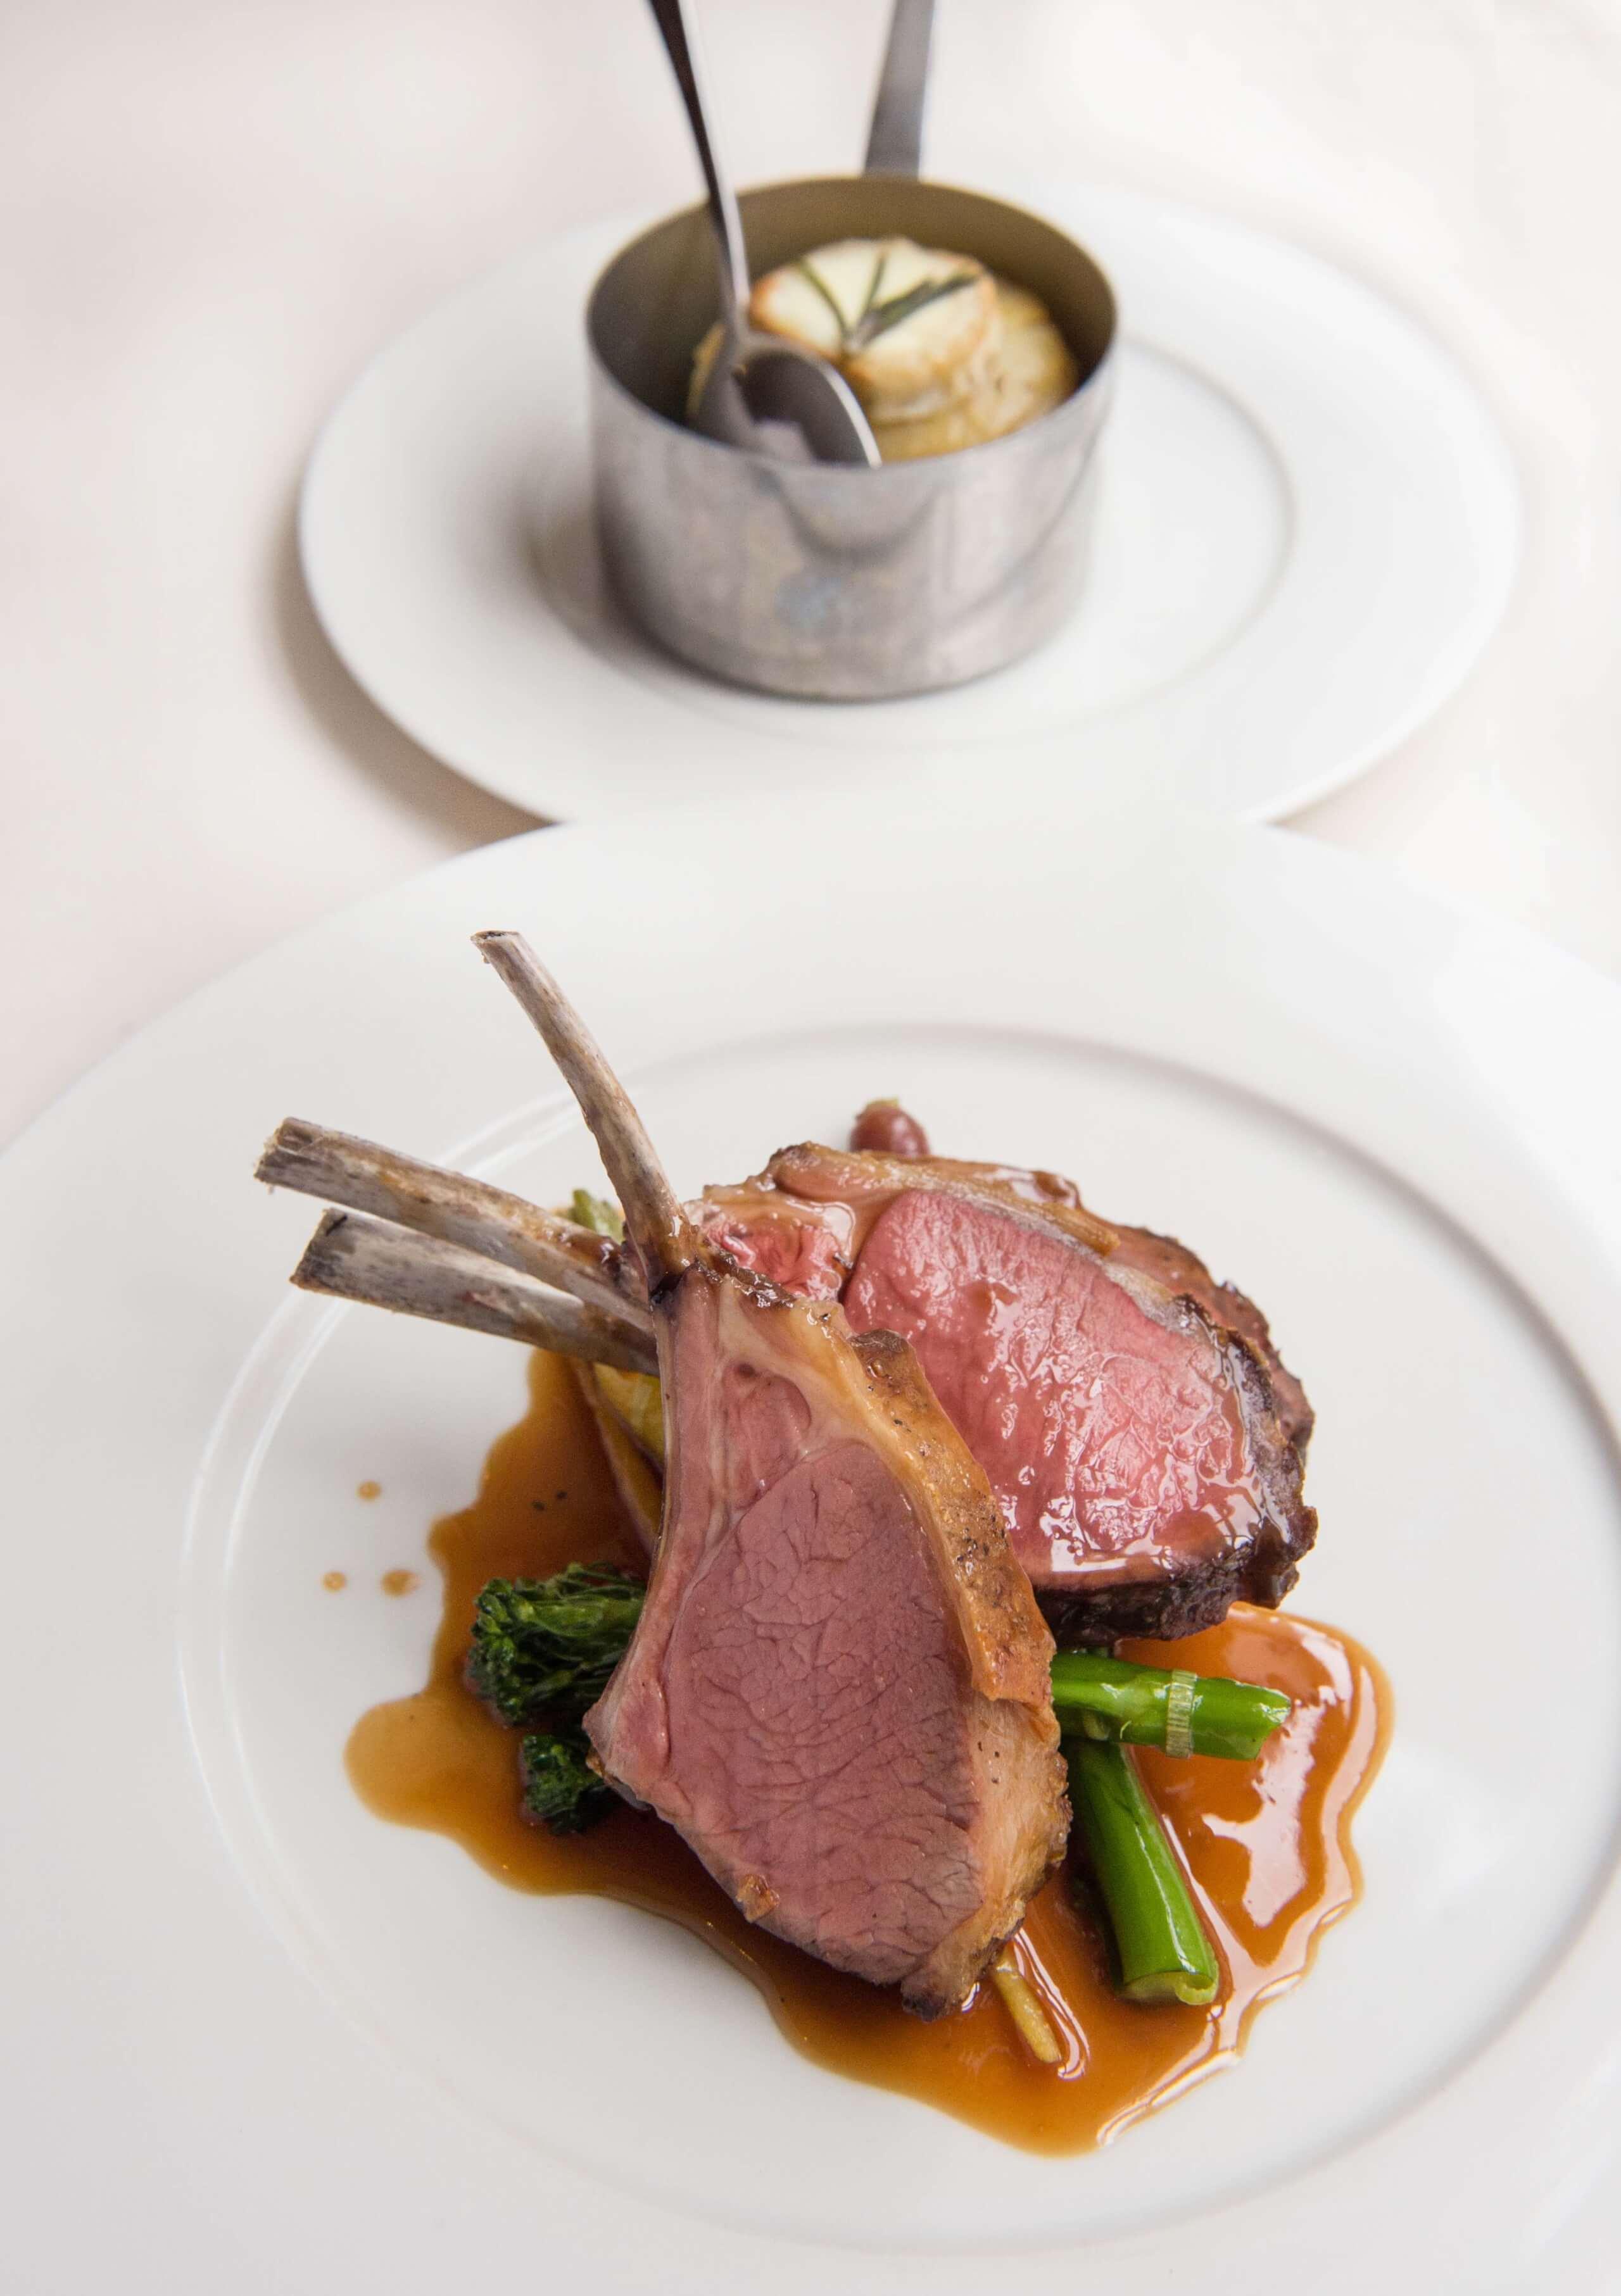 108 Brasserie - Roast rack of new season lamb and Bosworth Ash gratin 2